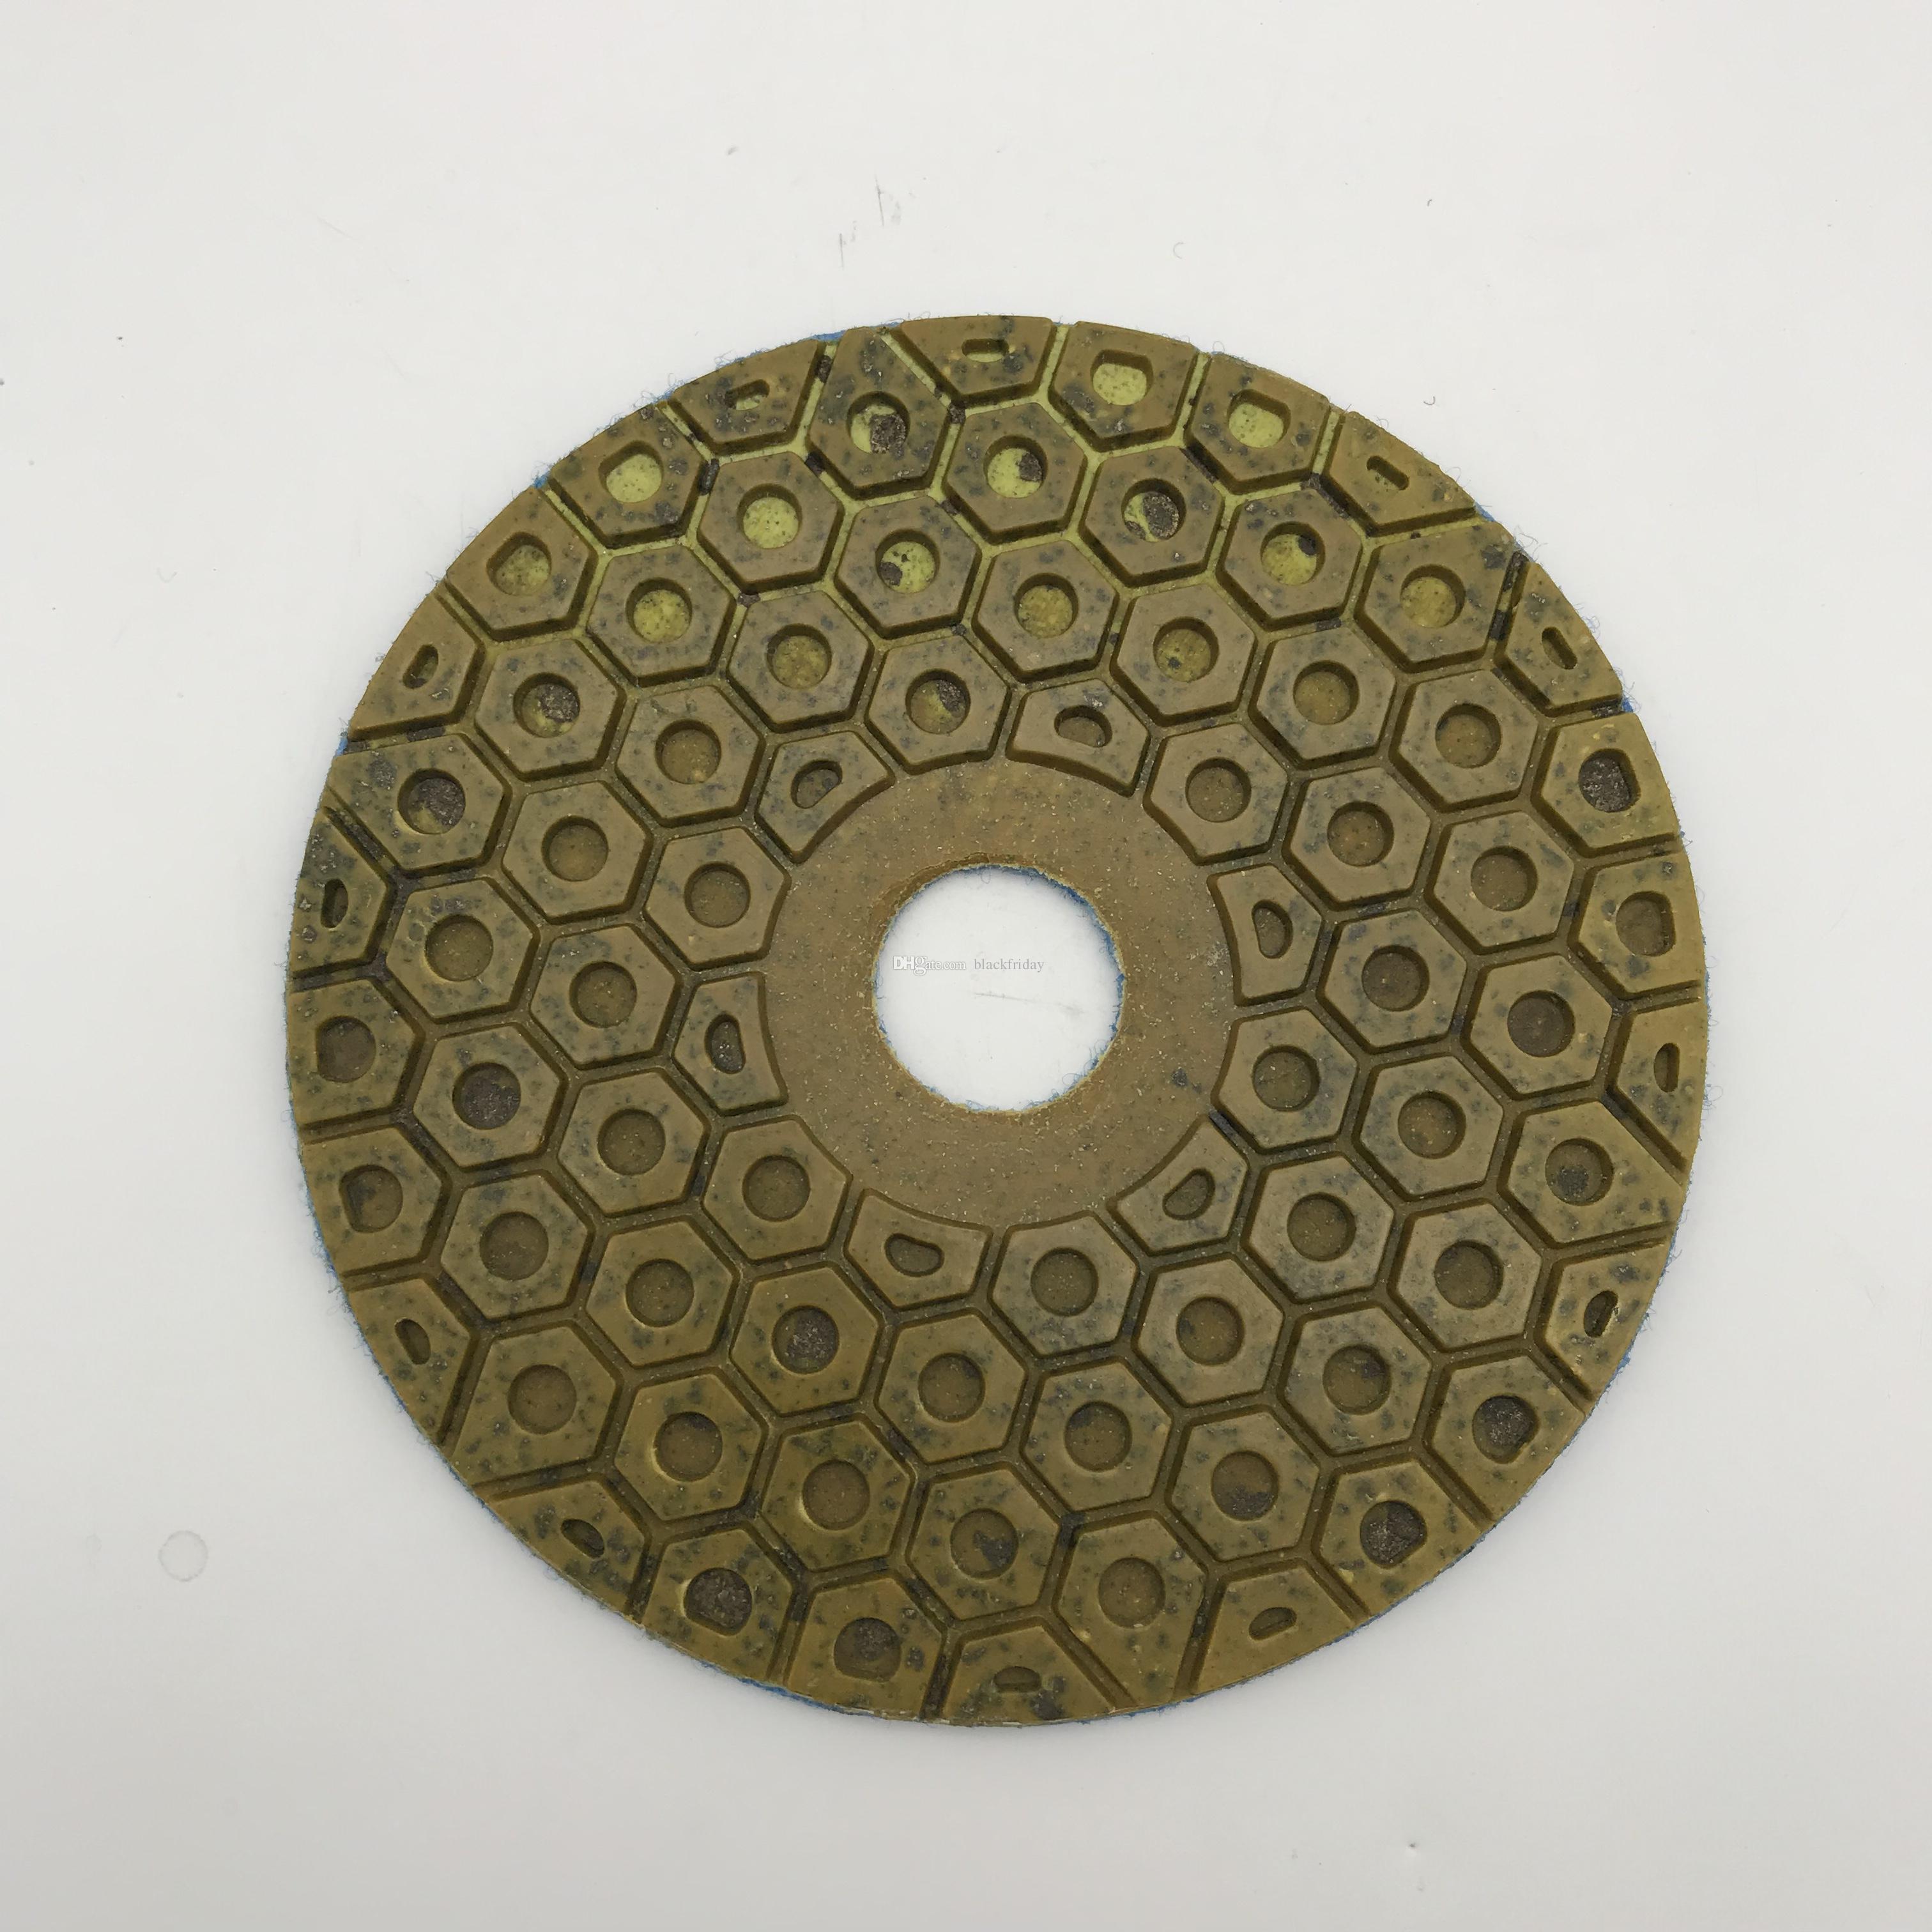 Diamond Metal Polishing Pad 6 inch (150 mm) for Granite Concrete Floor  Grinding Stone Resin Circle Polishing Wheel Grit 50